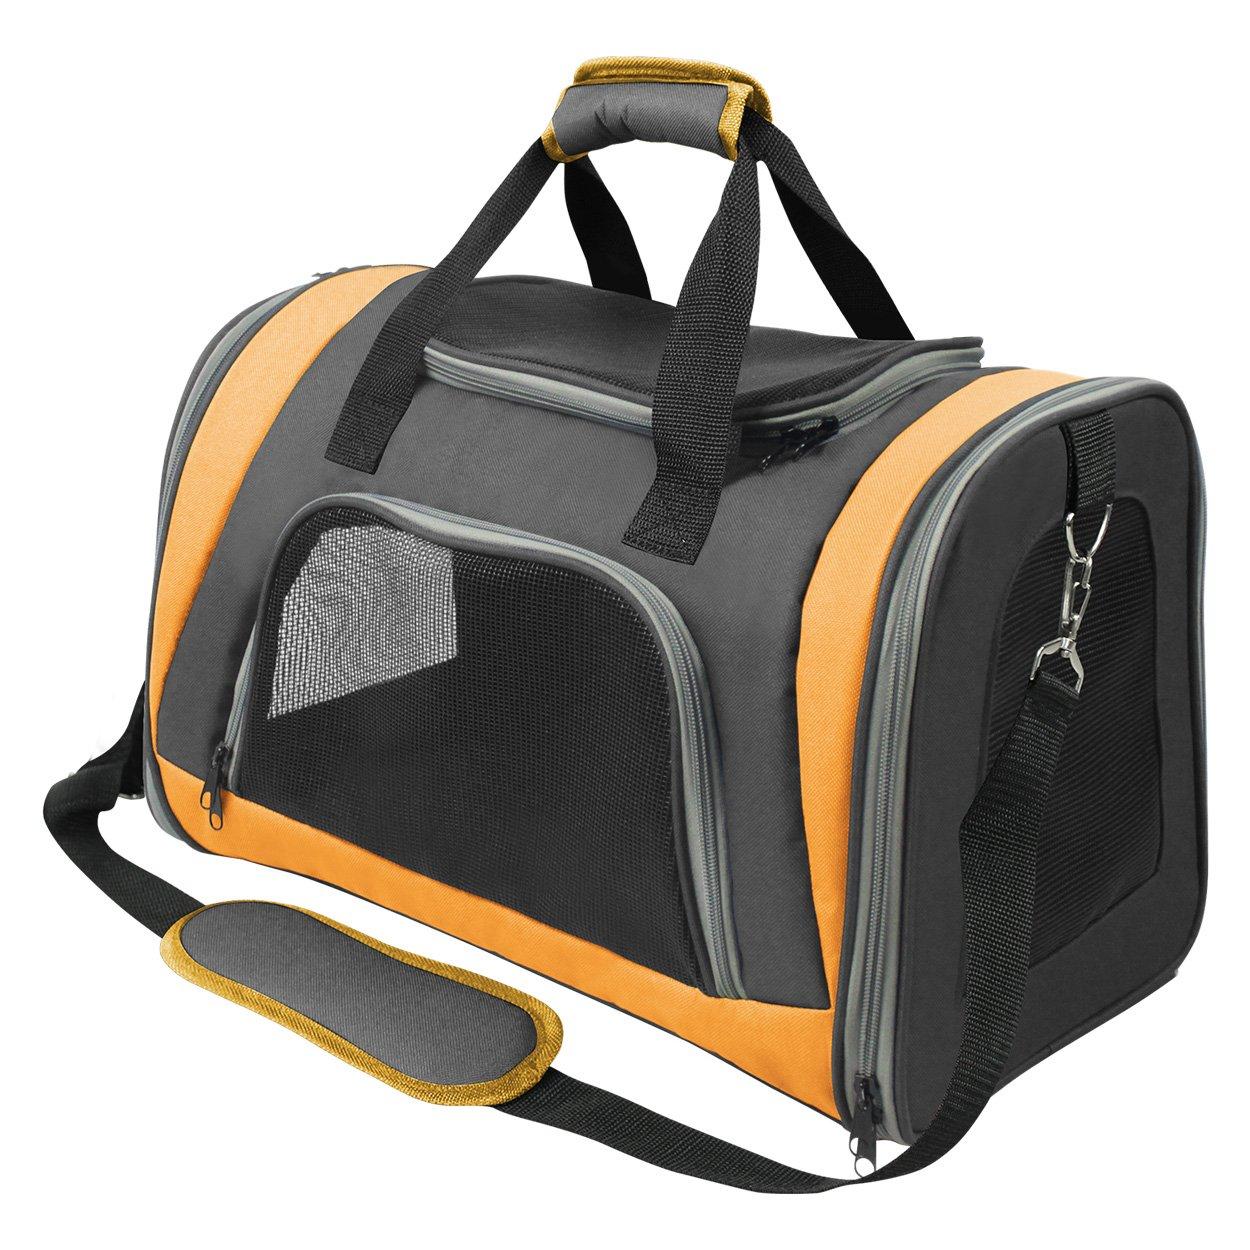 Animal Treasures 31118 Easy Go Soft Carrier, orange